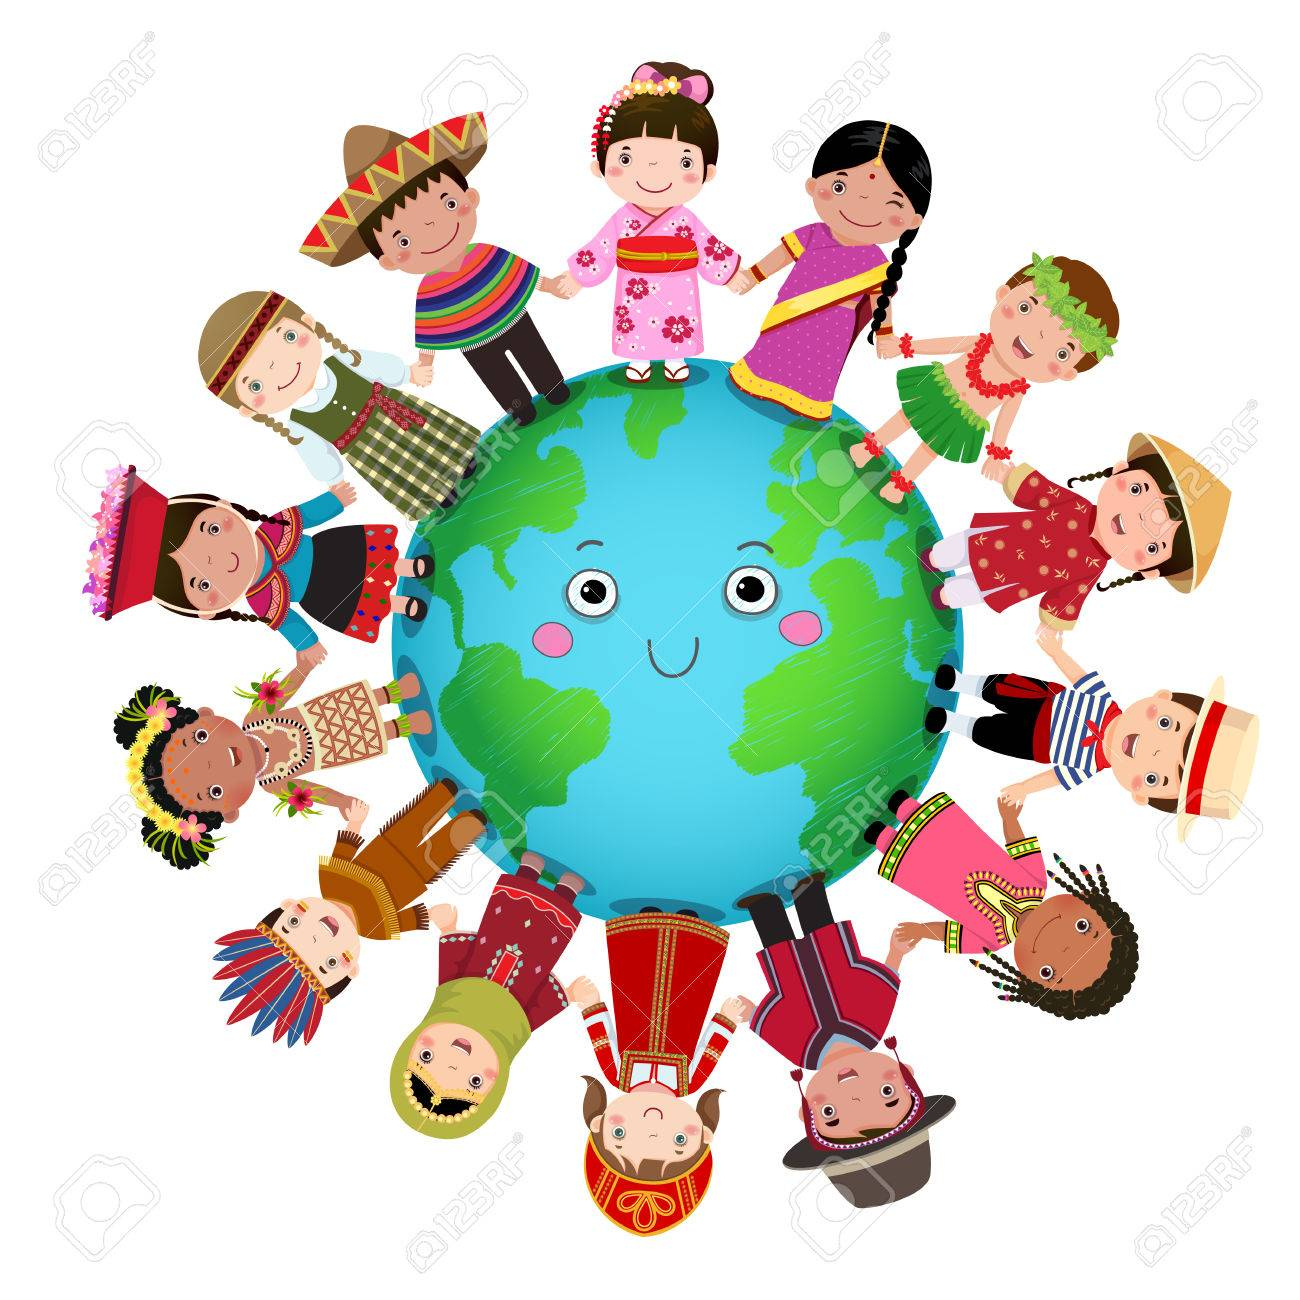 Multicultural children holding hand around the world.